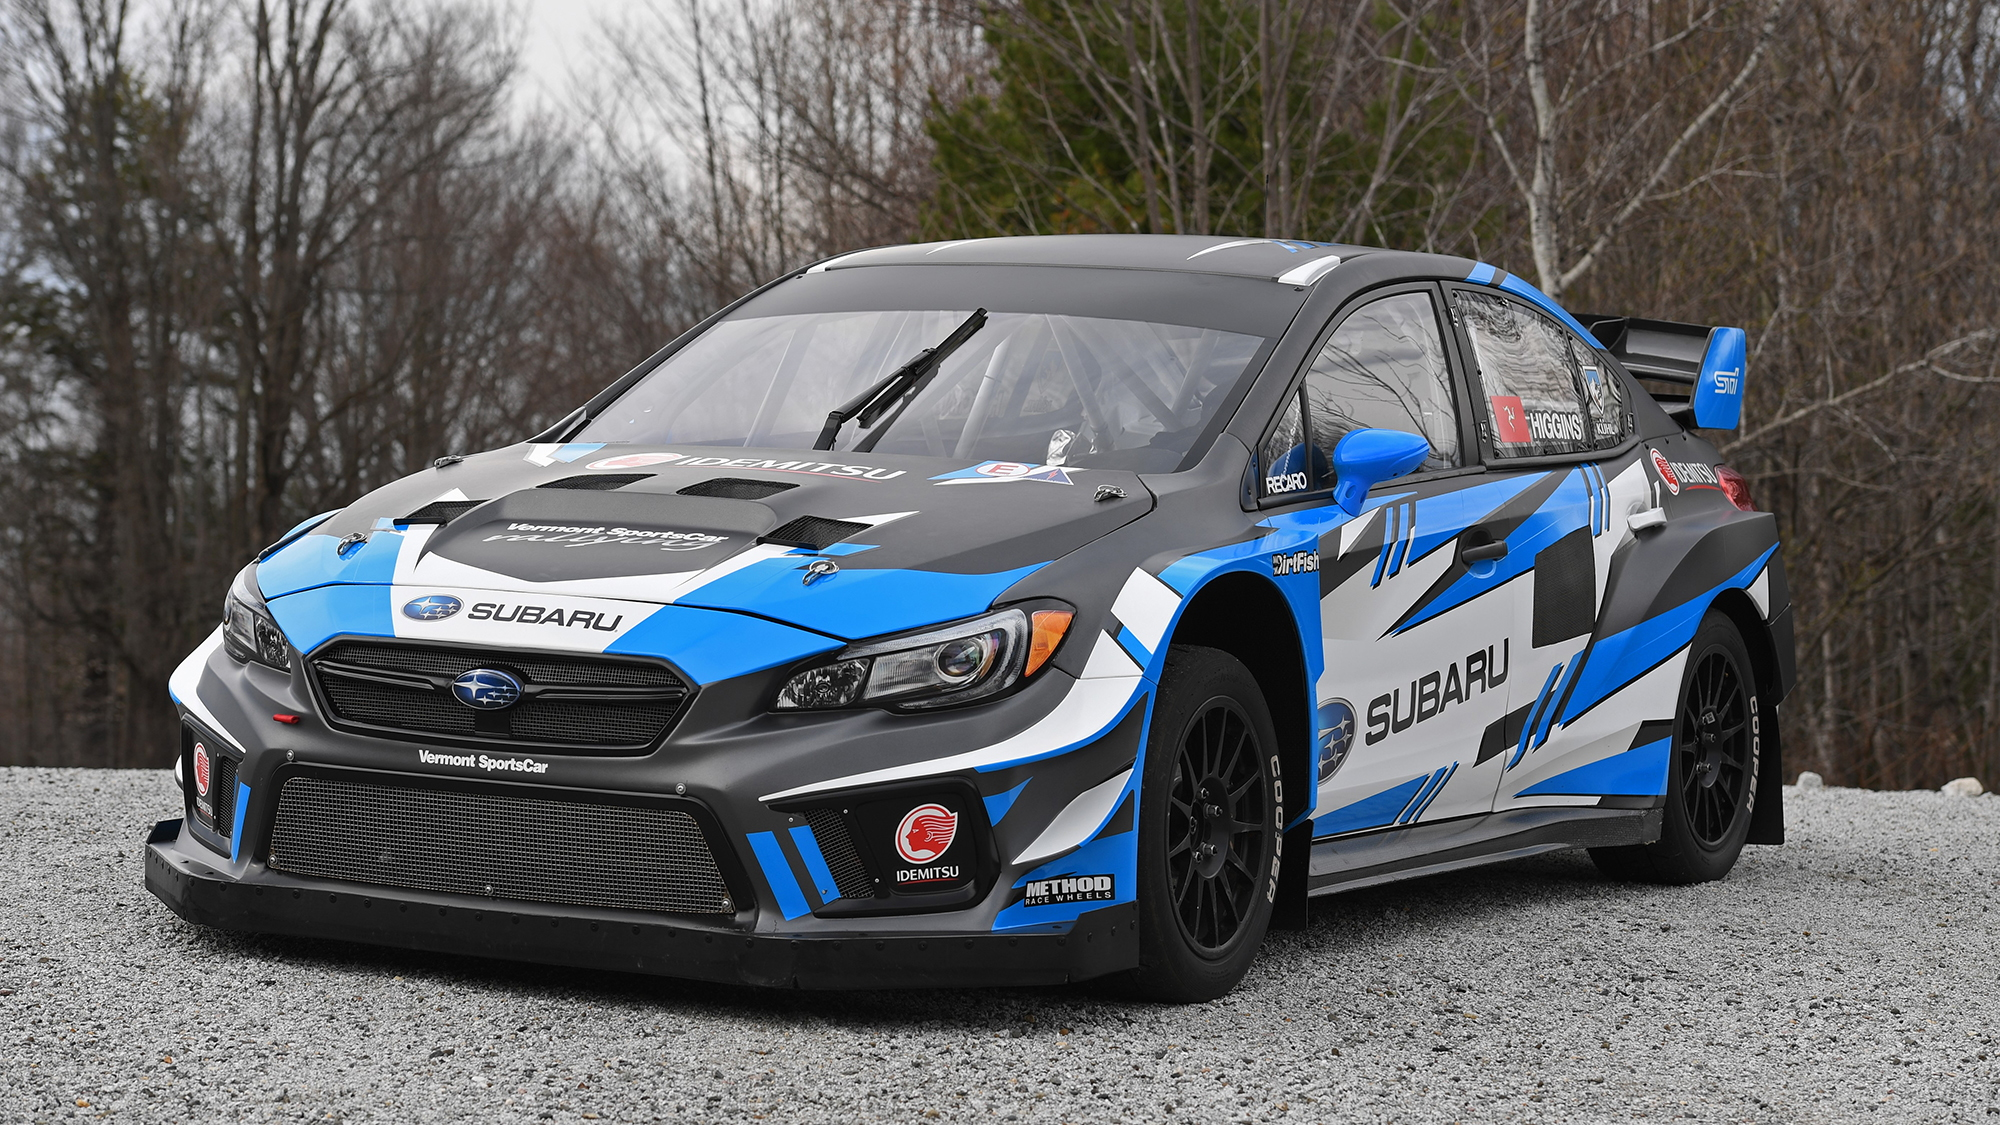 David Higgin's Subaru Americas Rallycross Championship team car